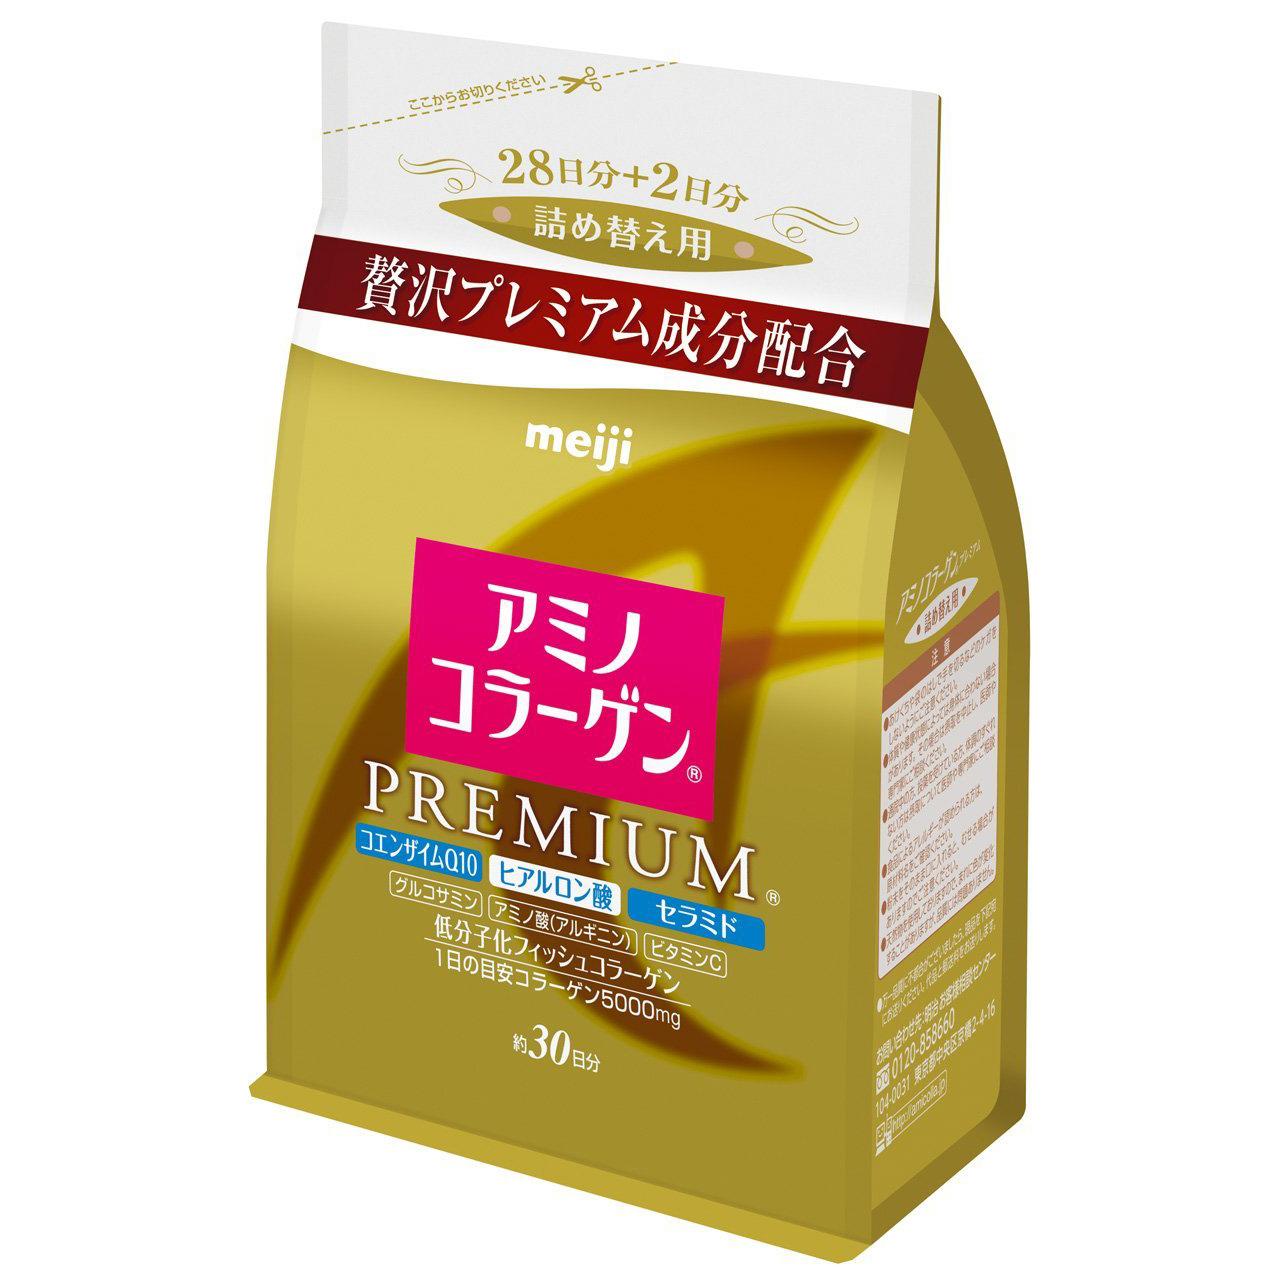 Meiji 日本明治 日本熱銷NO.1 膠原蛋白粉補充包袋裝214g 白金尊爵版 添加Q10及玻尿酸 PG美妝